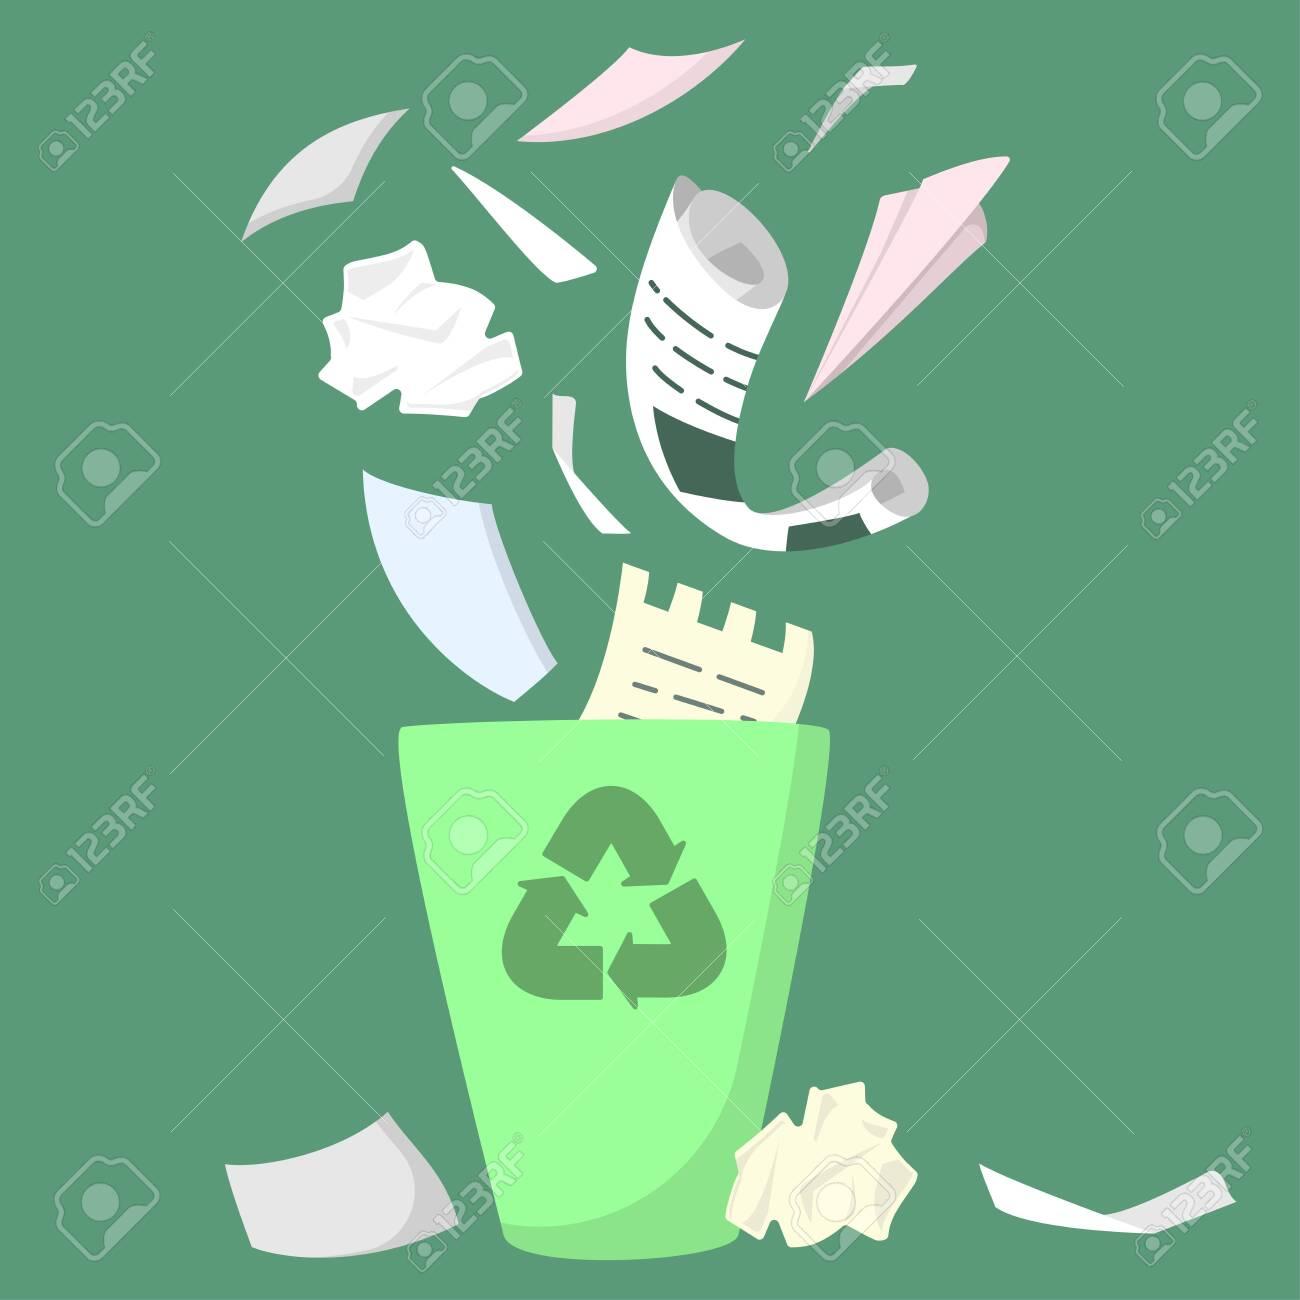 Waste paper bin. Flat style vector illustration - 129013190